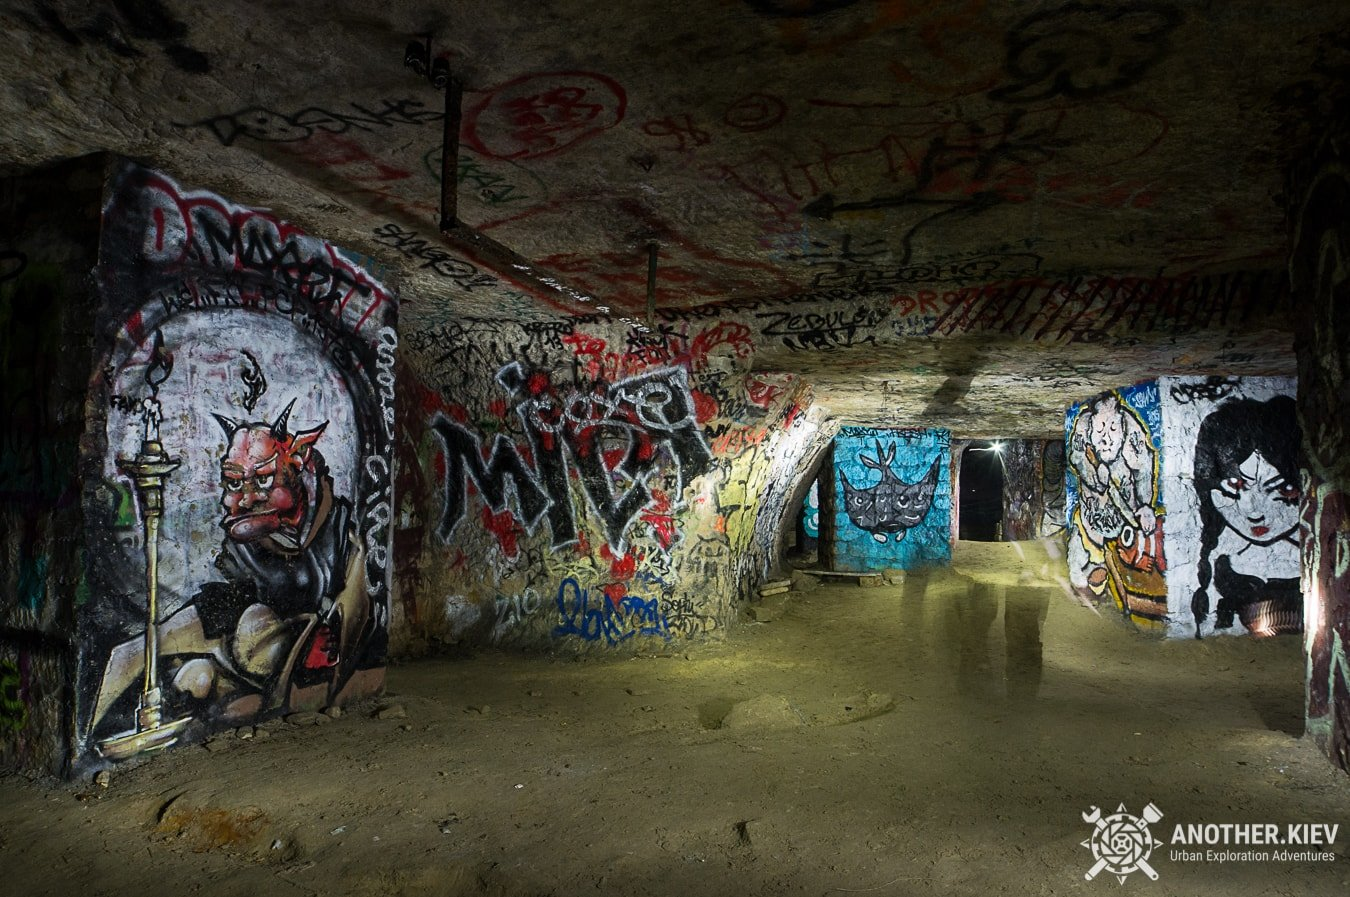 paris-catacombs-dark-urbex-tour-exploring-underground-monmartre PARIS CATACOMBS DARK TOUR